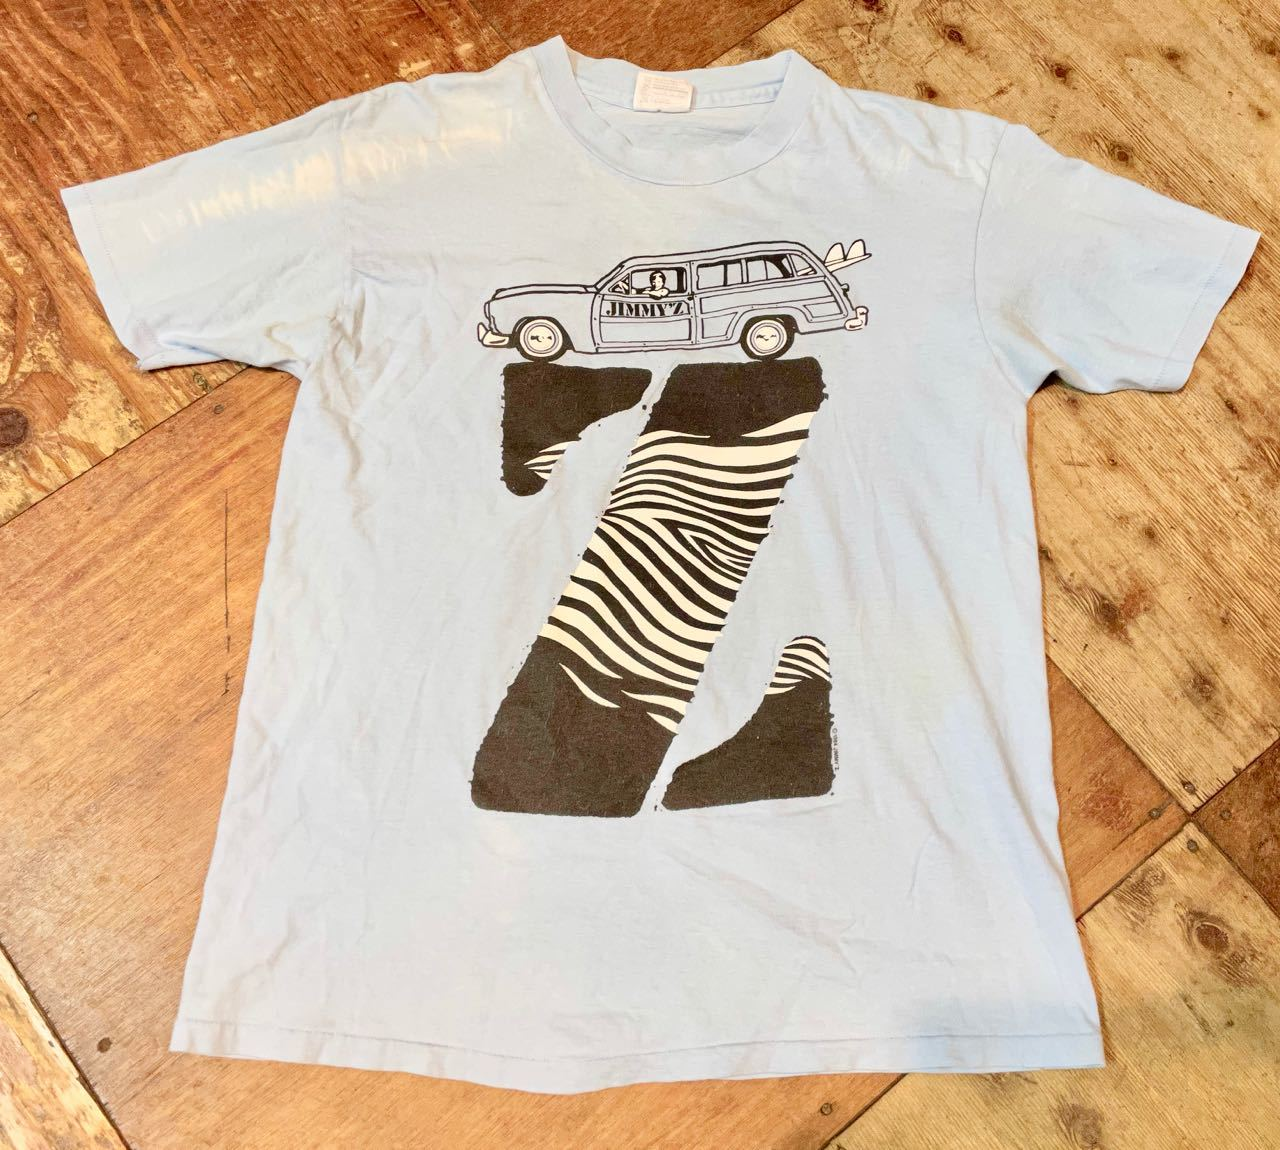 7月17日(土)入荷!80s~MADE IN U.S.A JIMMY\'Z  Tシャツ!_c0144020_13193669.jpg